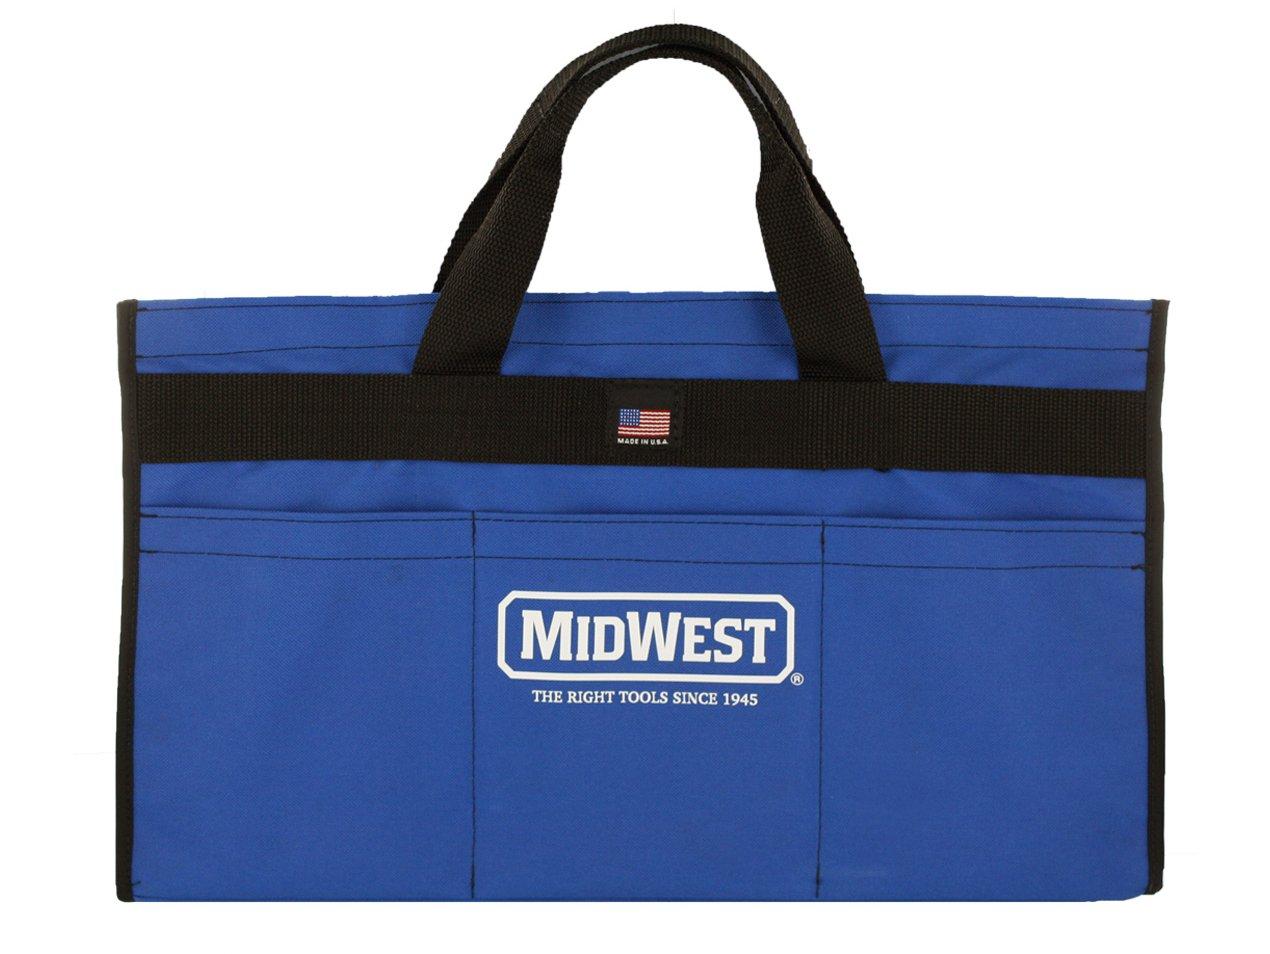 Midwest MWTBULDKIT01 Building Tool Kit 5 Piece Set